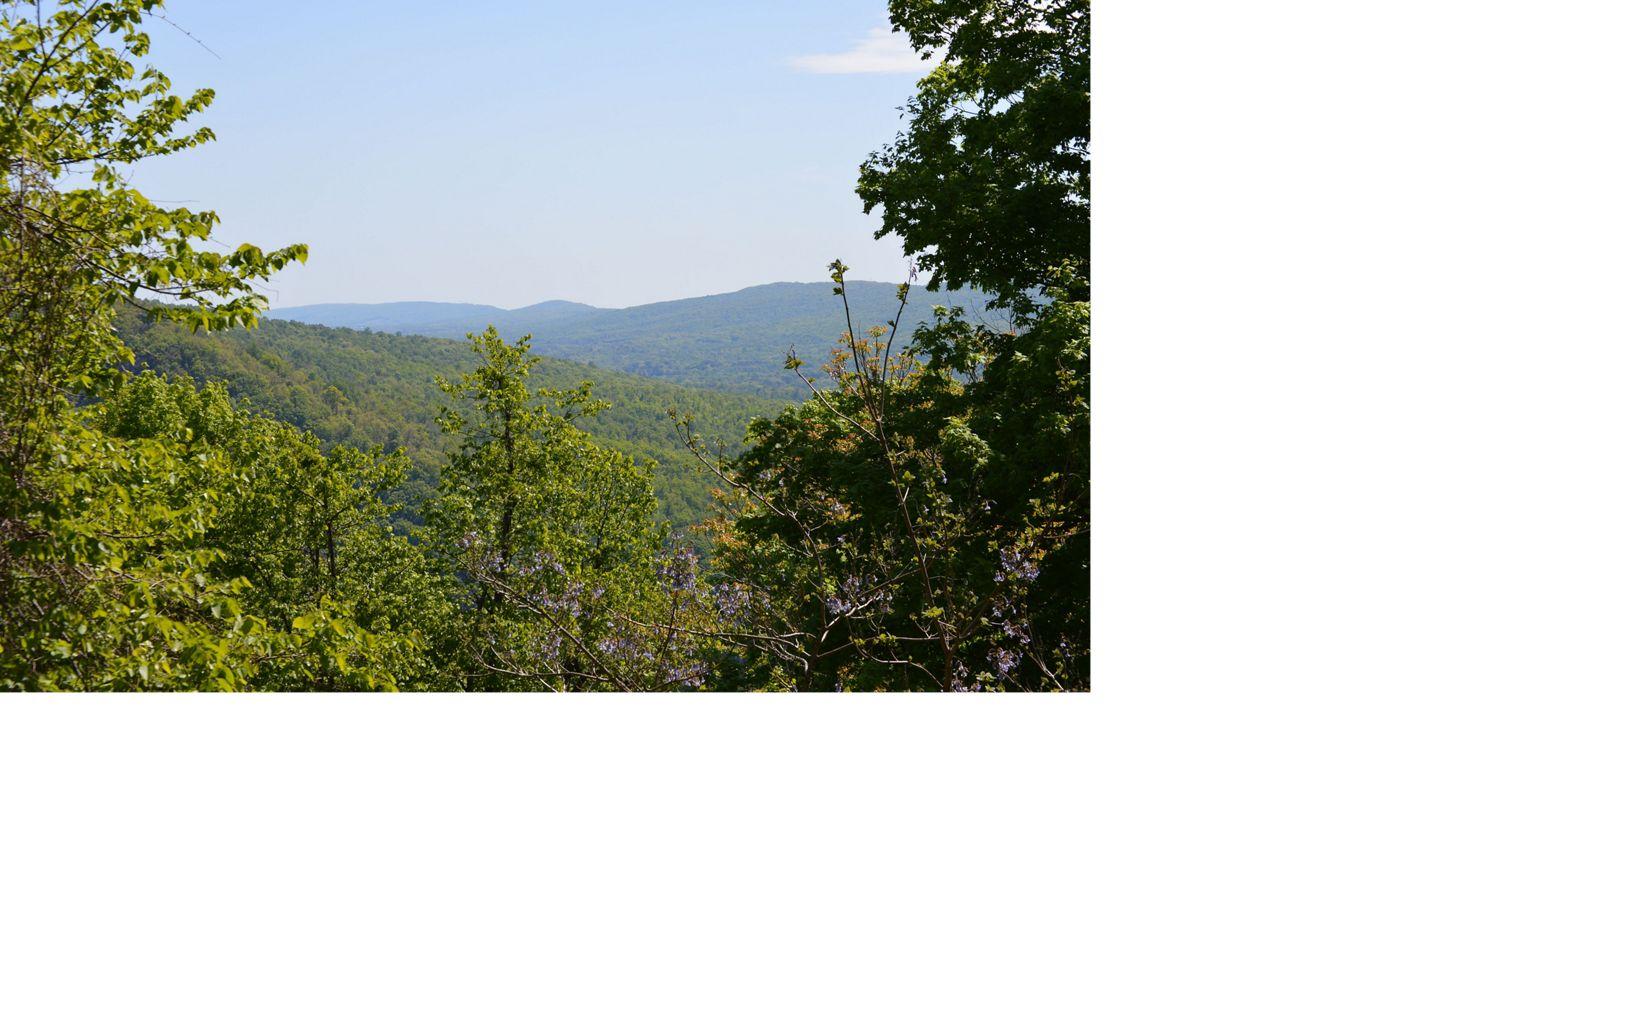 View of the Kittatinny Ridge from the Cove Mountain, Pennsylvania.